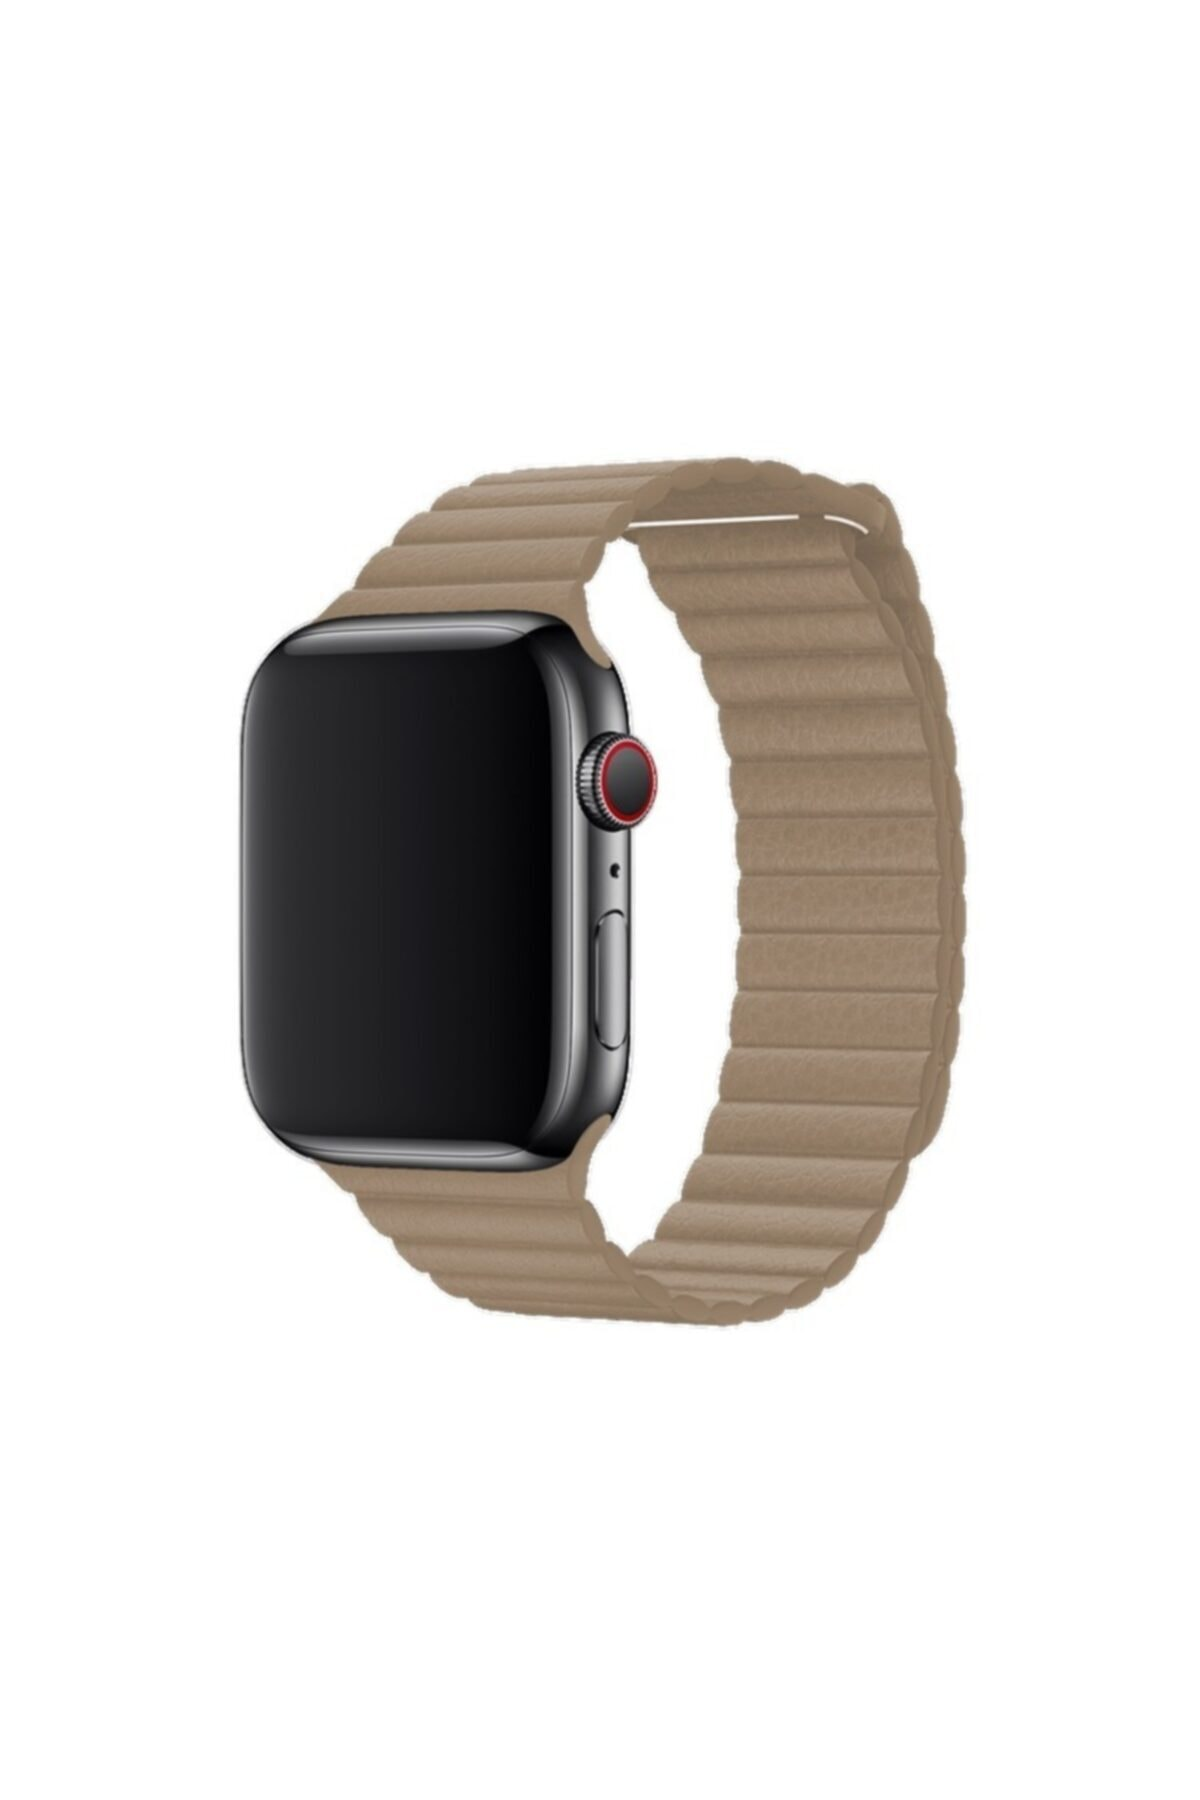 Schulzz Krem Apple Watch Seri 1-2-3-4-5 Premium 42-44 mm Kordon 2